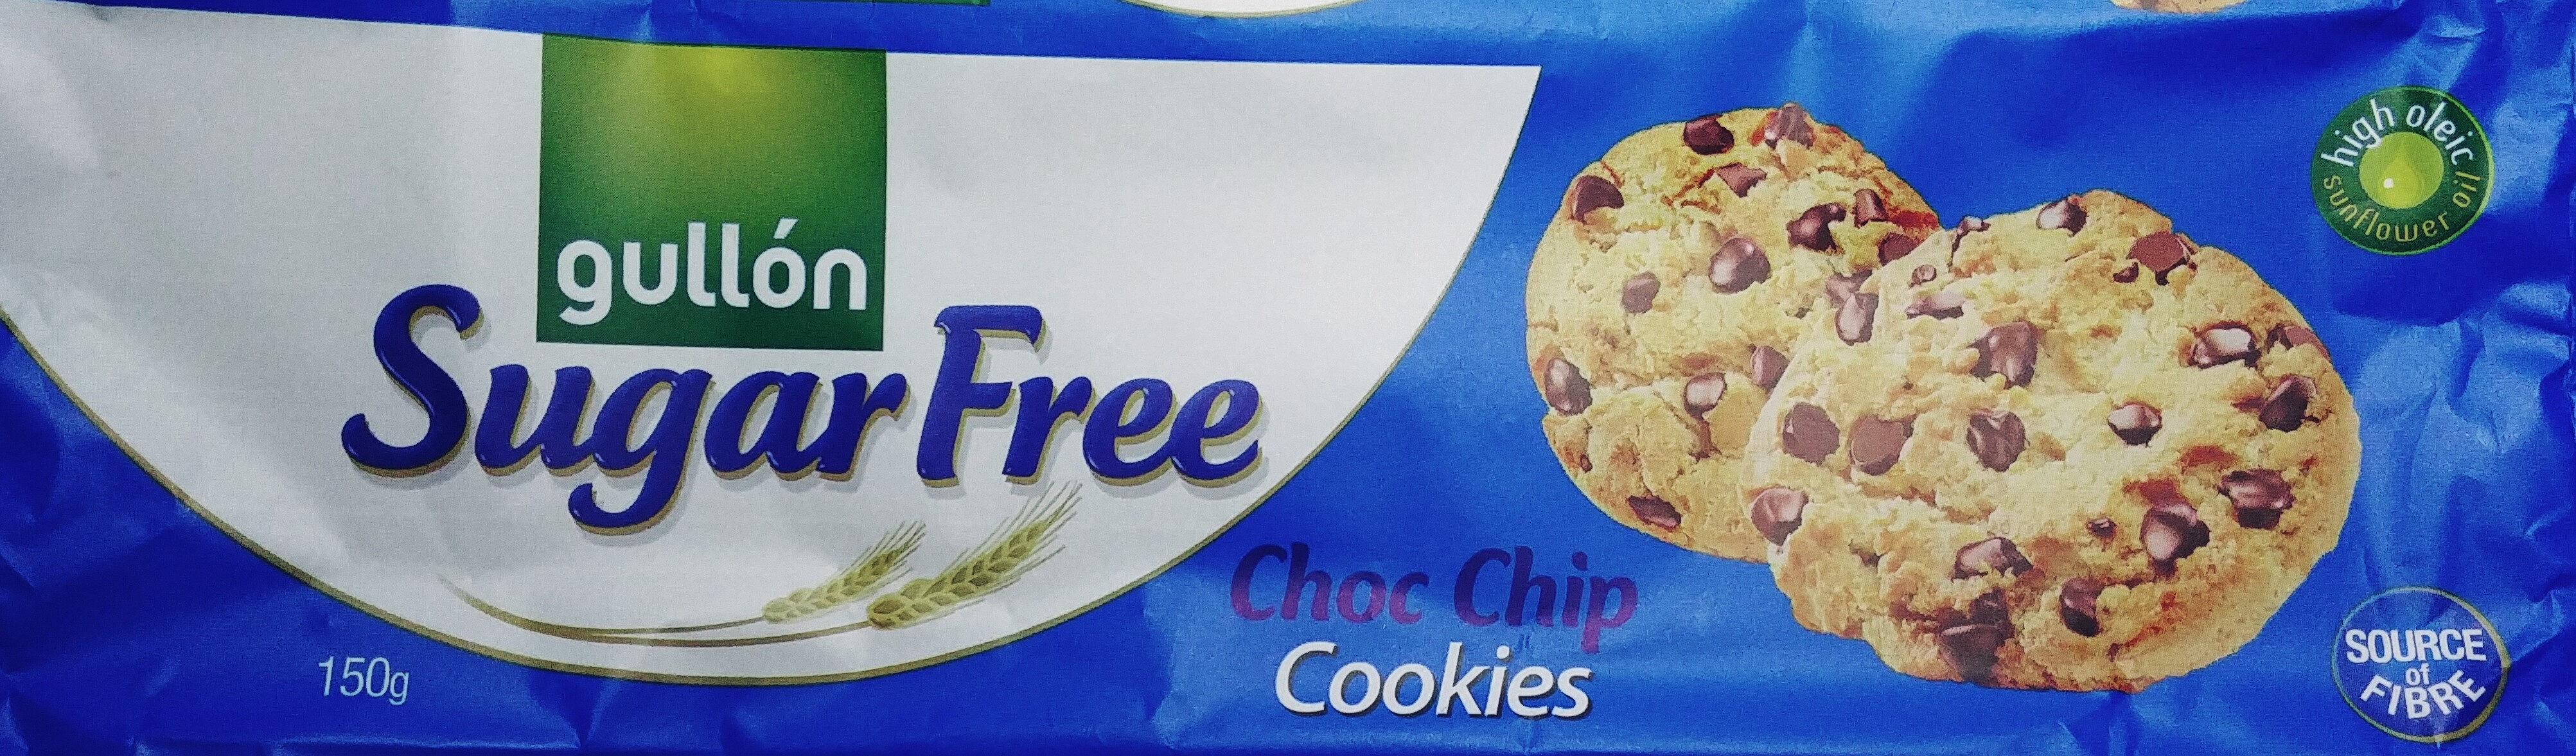 Sugar Free Choc Chip Cookies - Produkt - pl